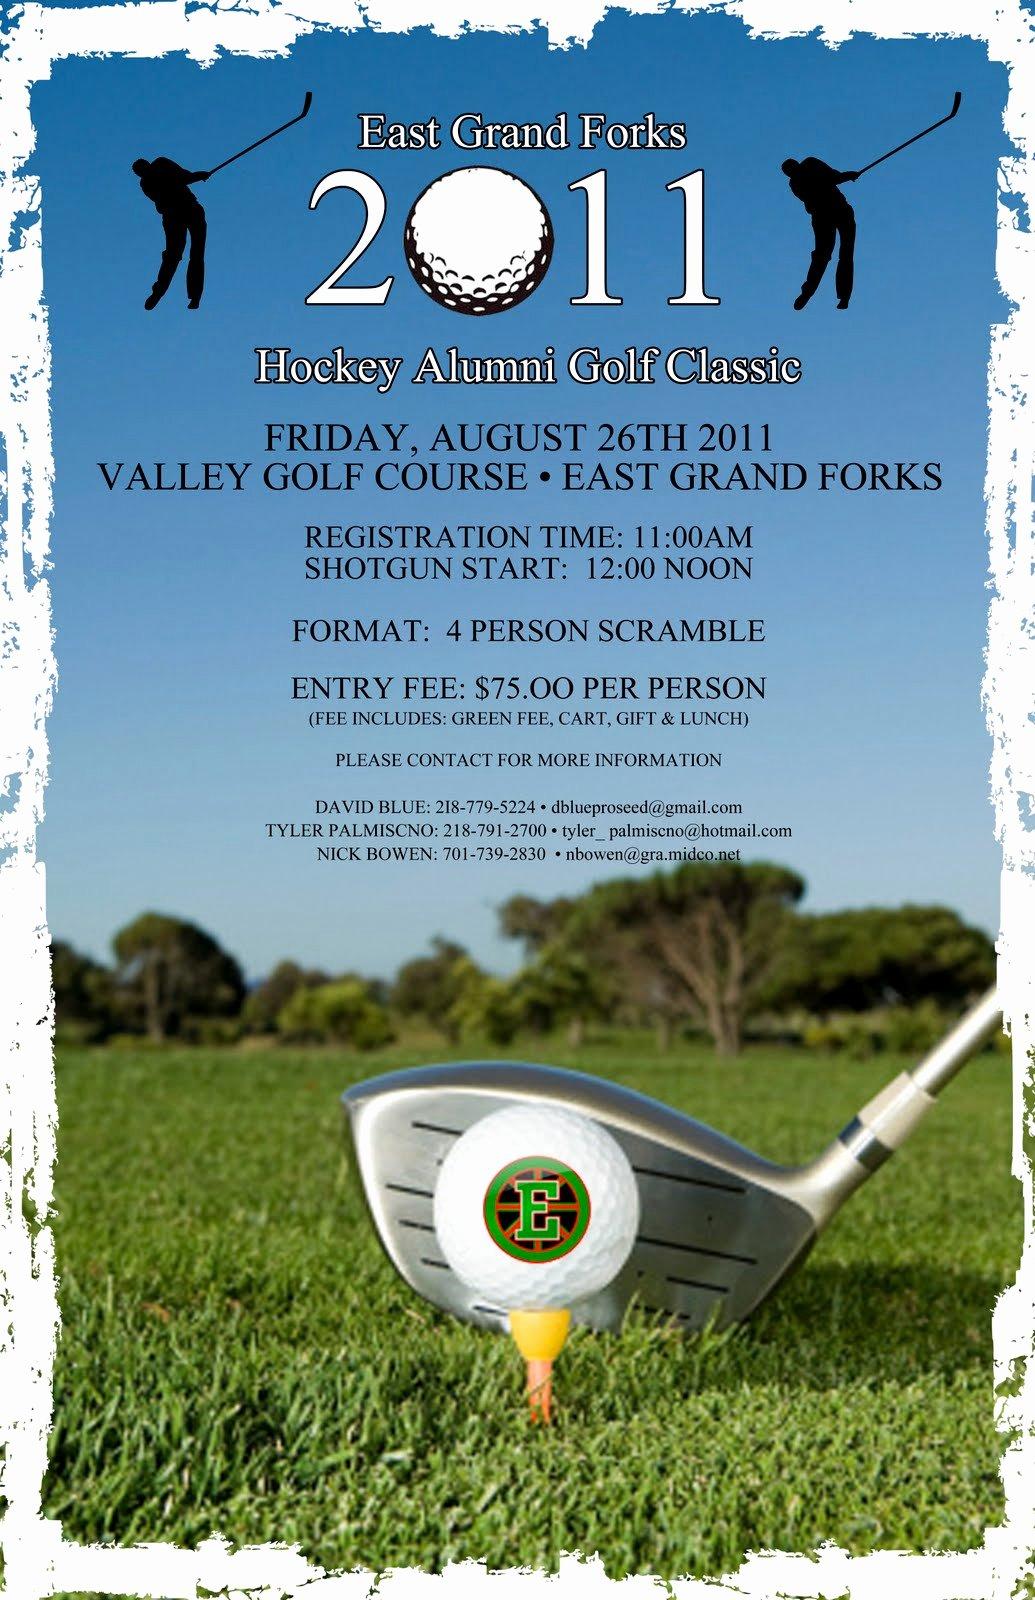 East Grand forks Greenwave Hockey Golf tournament